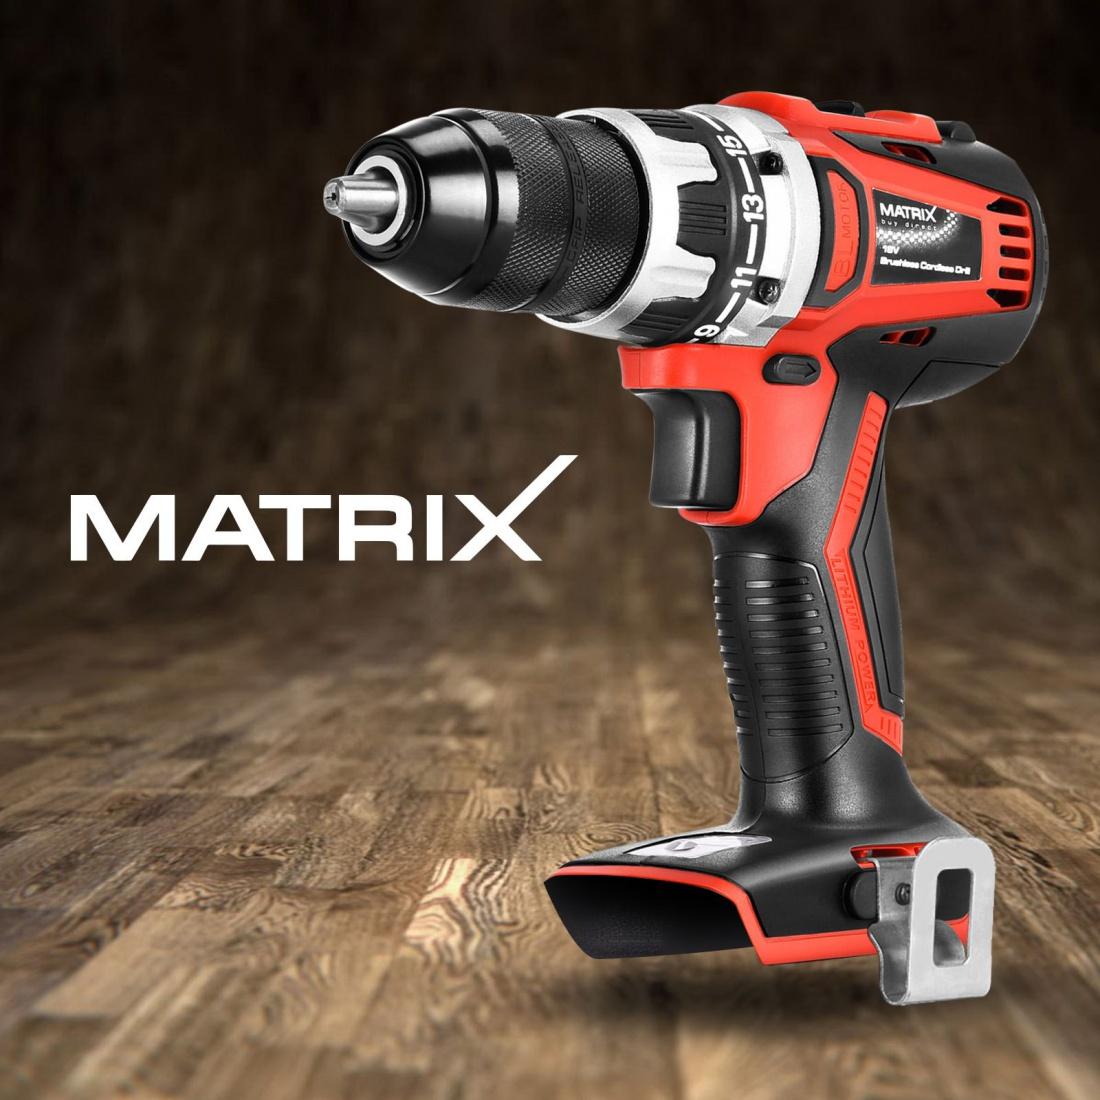 Matrix Brushless Cordless Drill Driver 20V Li-Ion Electric Power Tool Skin